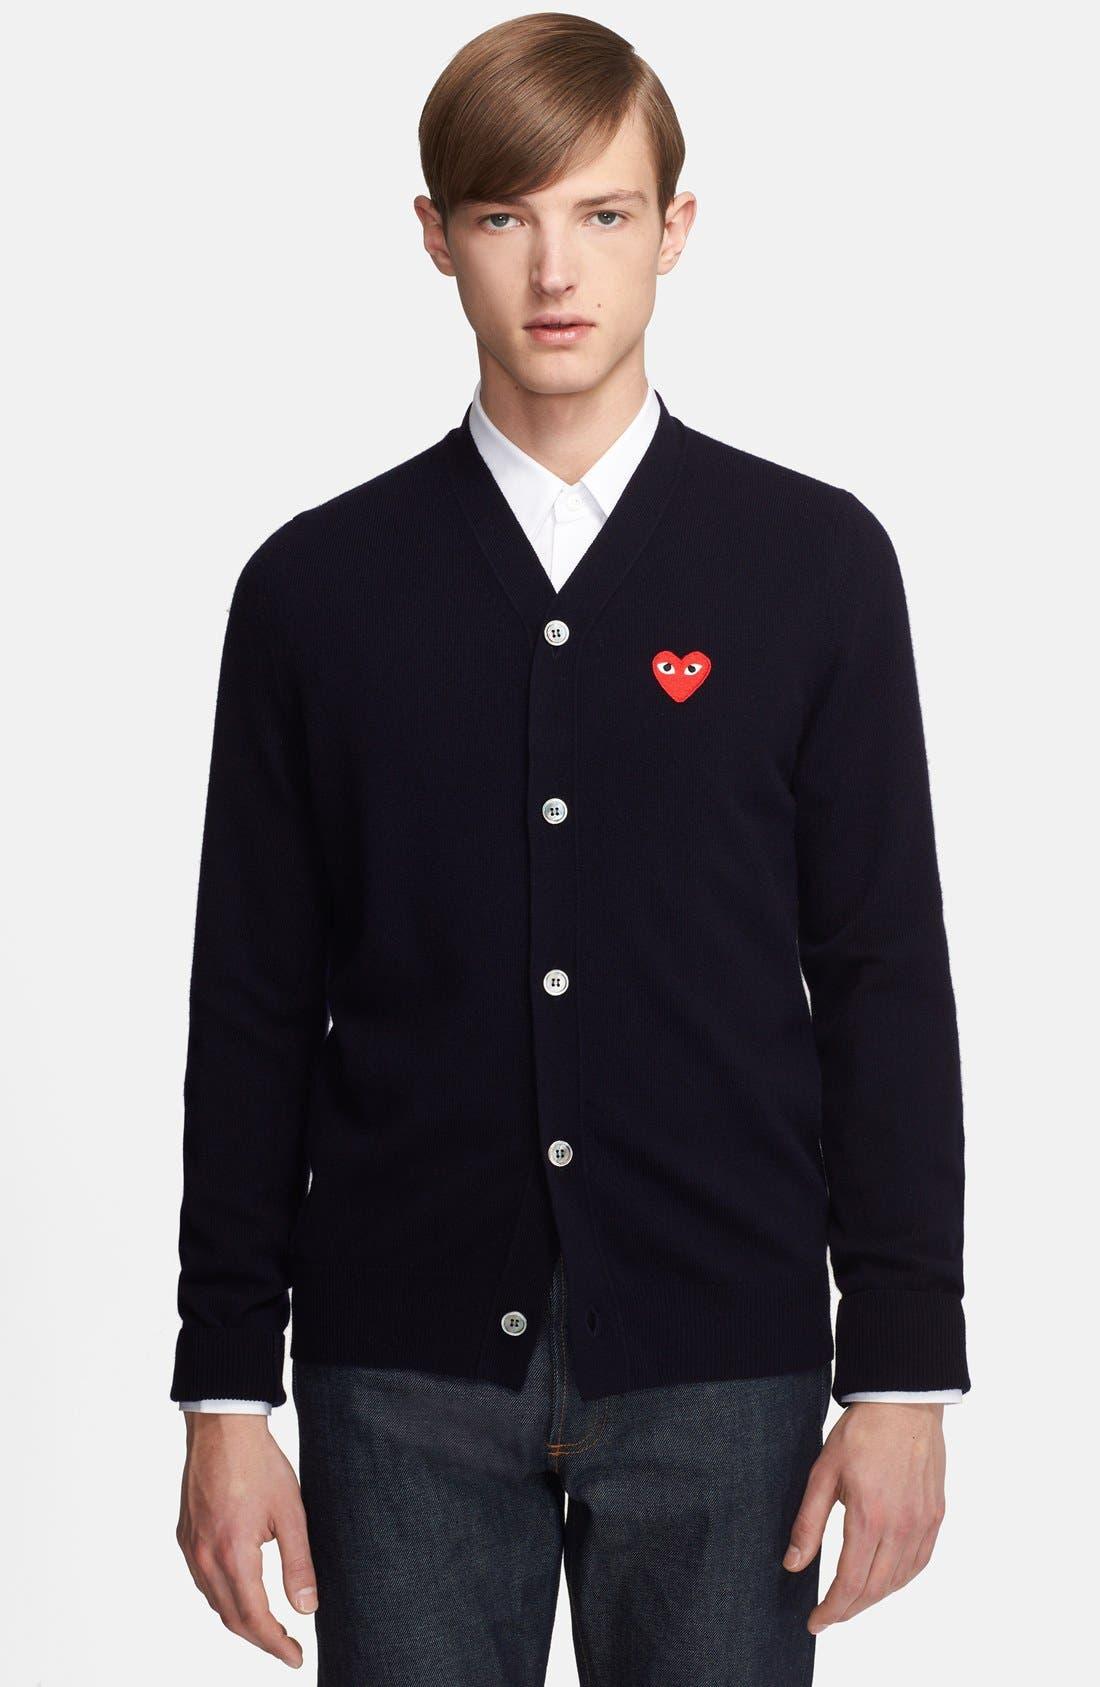 Main Image - Comme des Garçons PLAY Wool Cardigan with Heart Appliqué